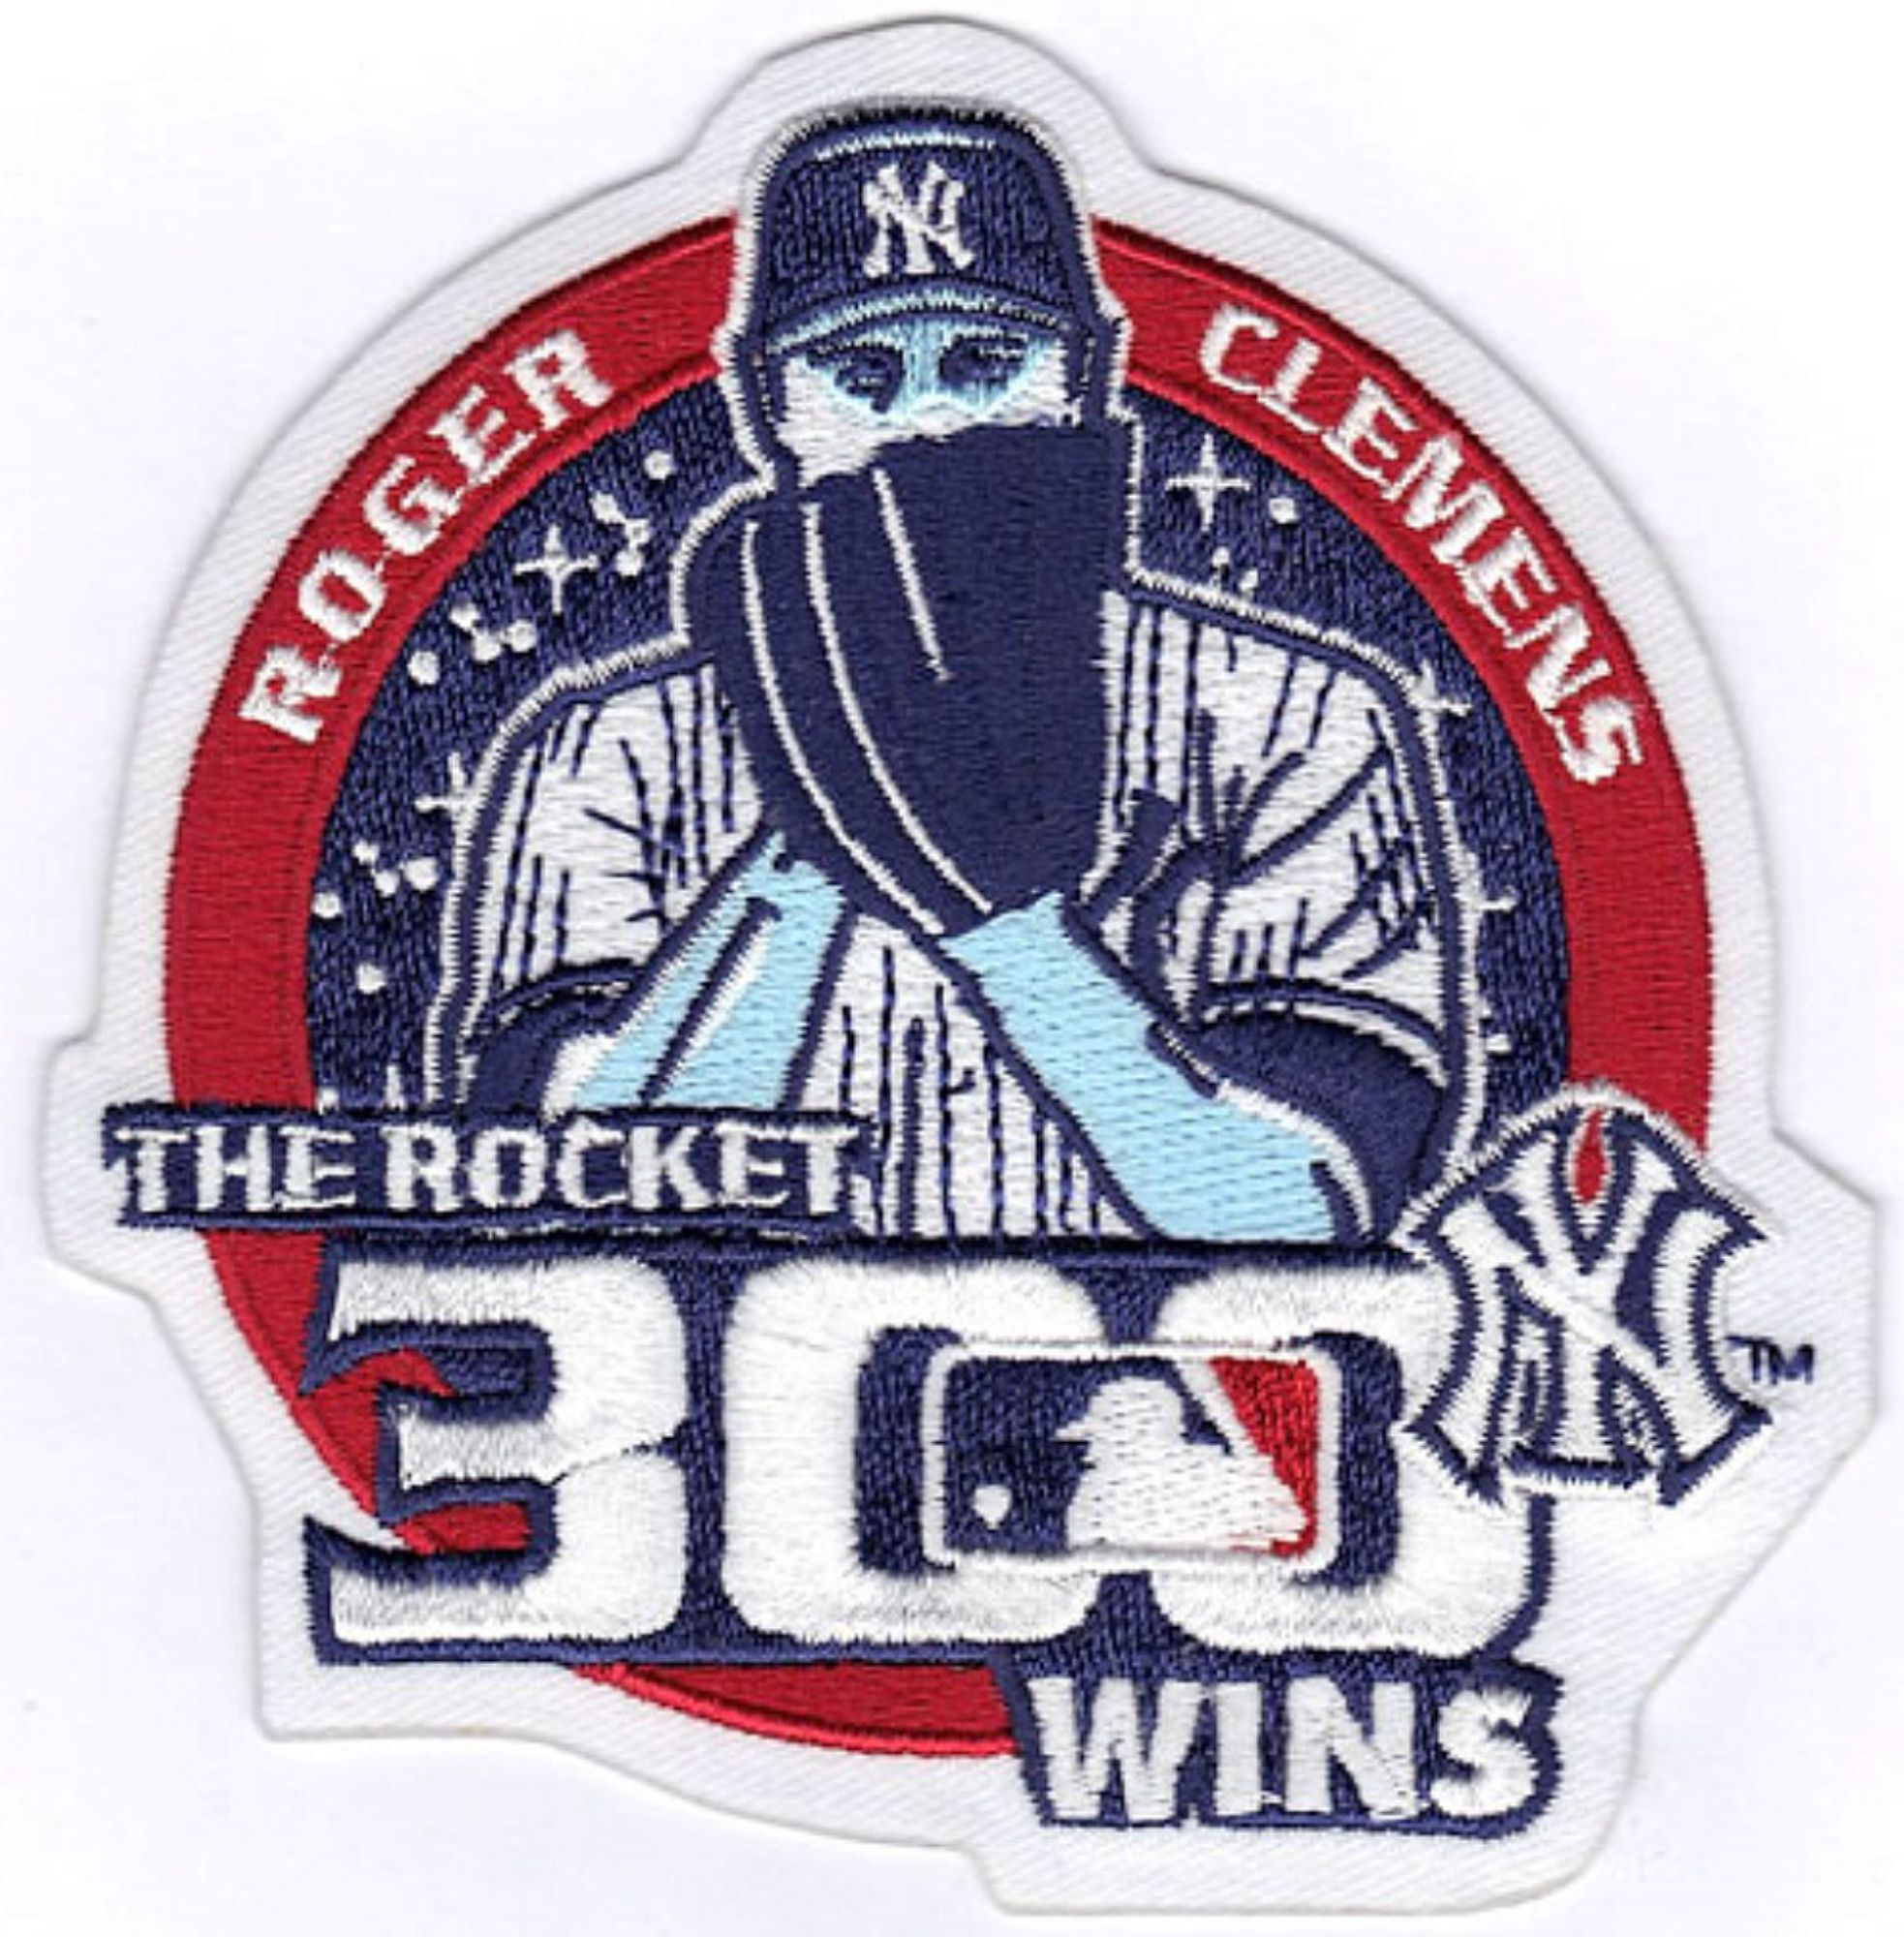 ac0b0acdf1a42 Roger Clemens 300 Wins Mlb Yankees